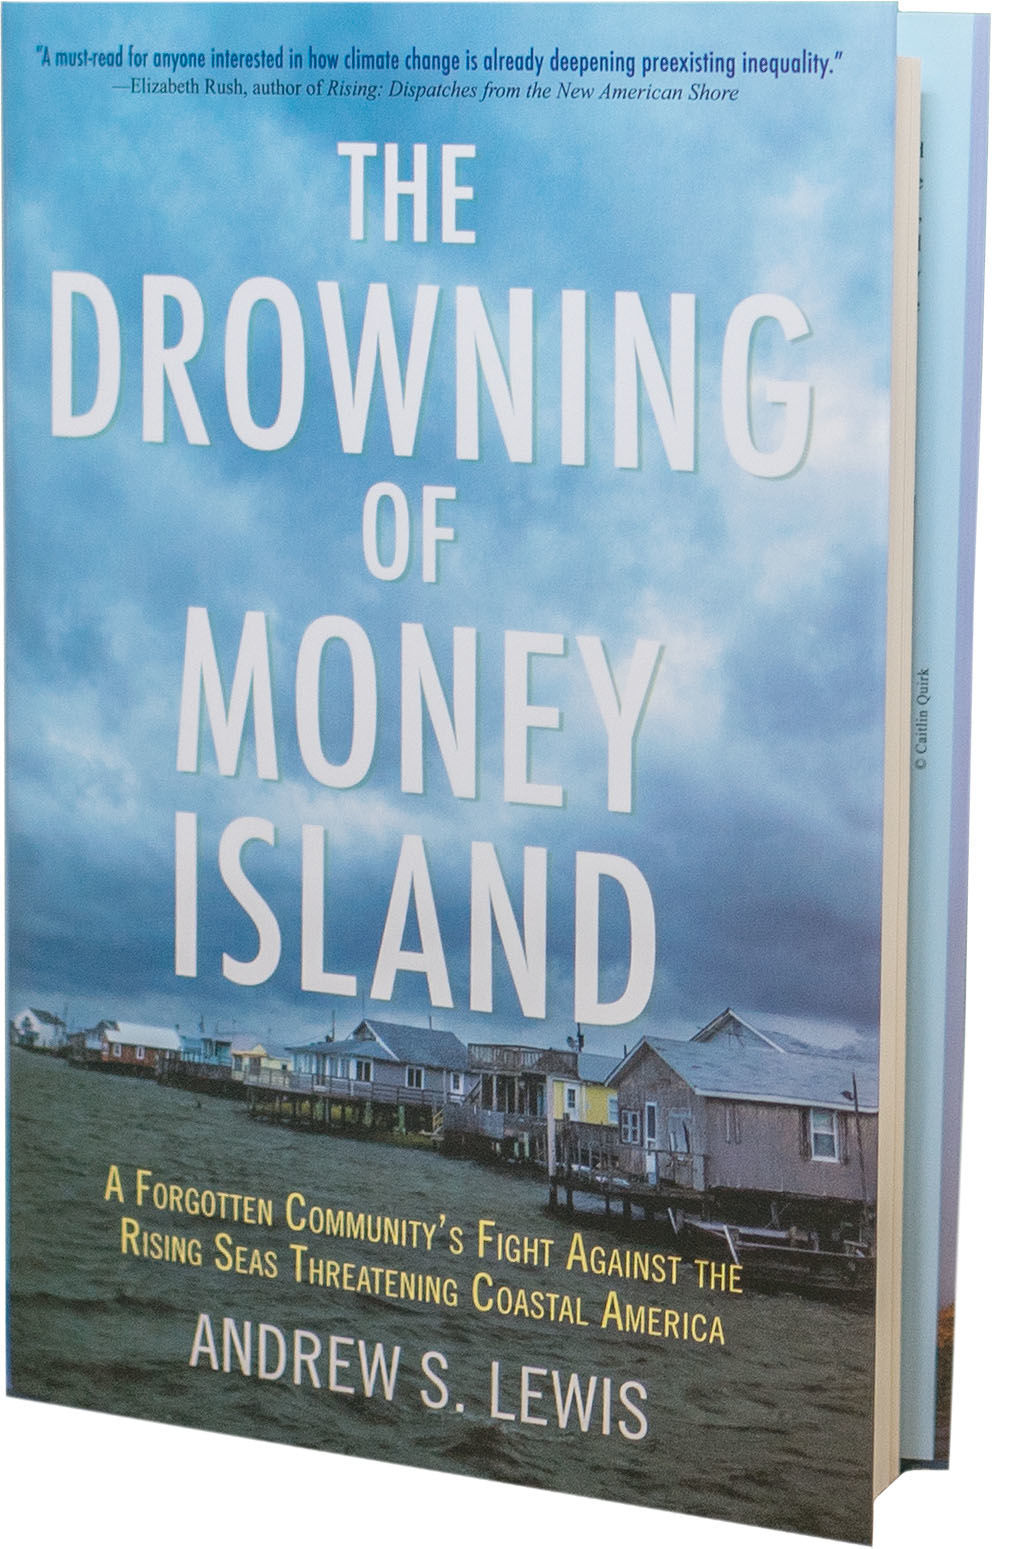 043020_gut_goc_rotary book-Money-Island_Mar2020